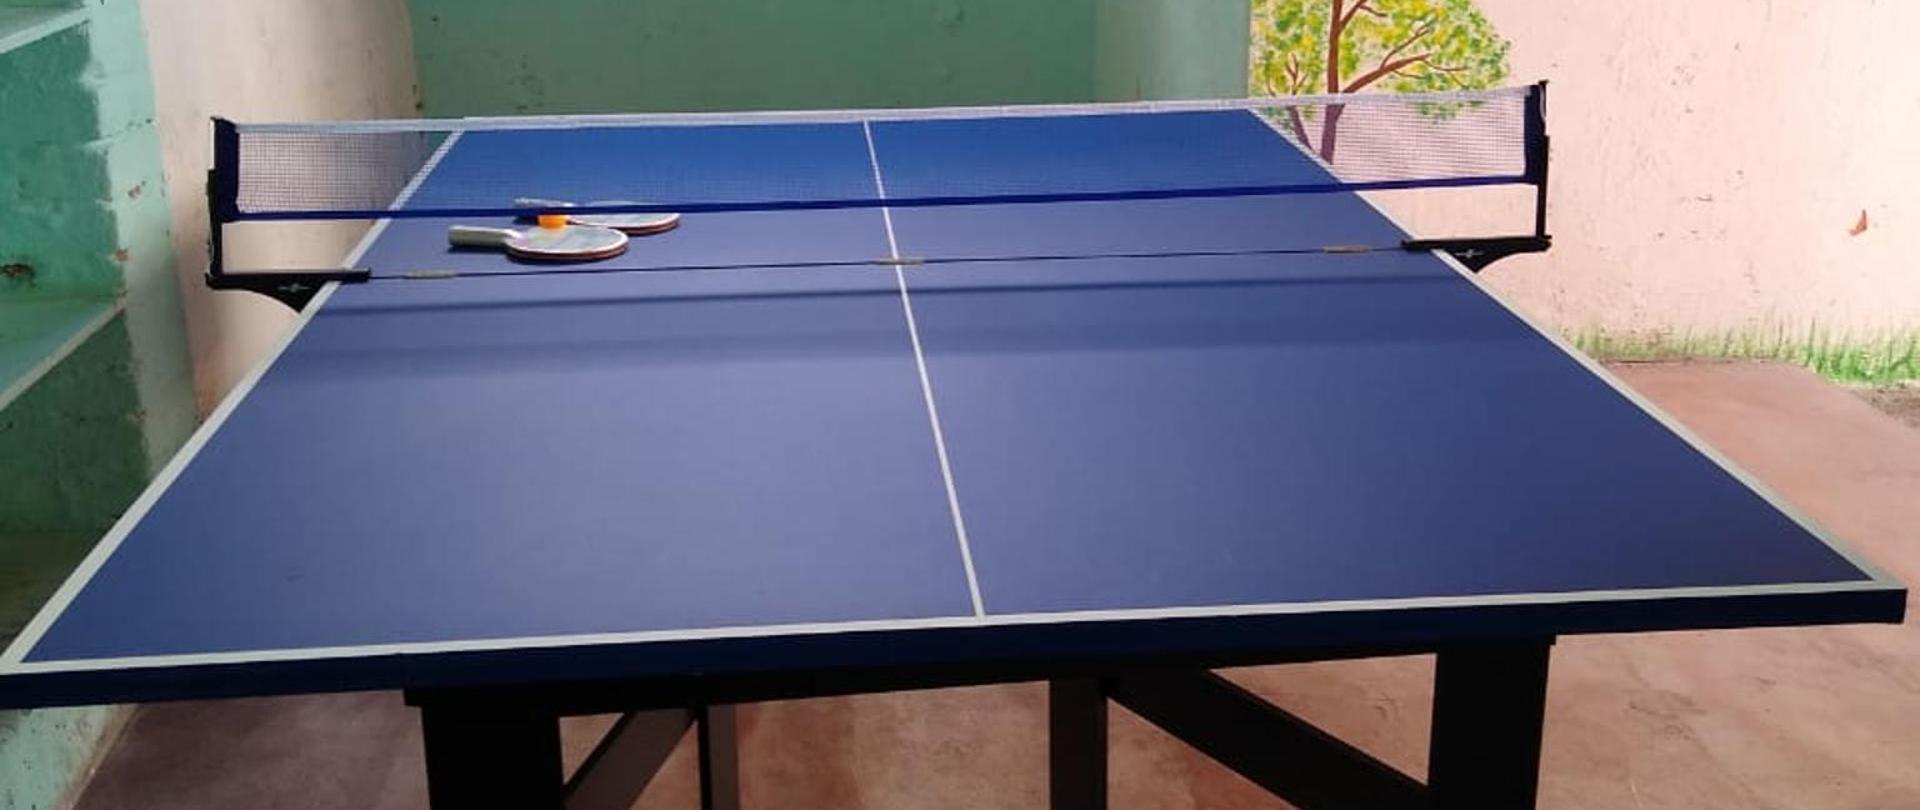 table tennis la casona don juan.jpeg